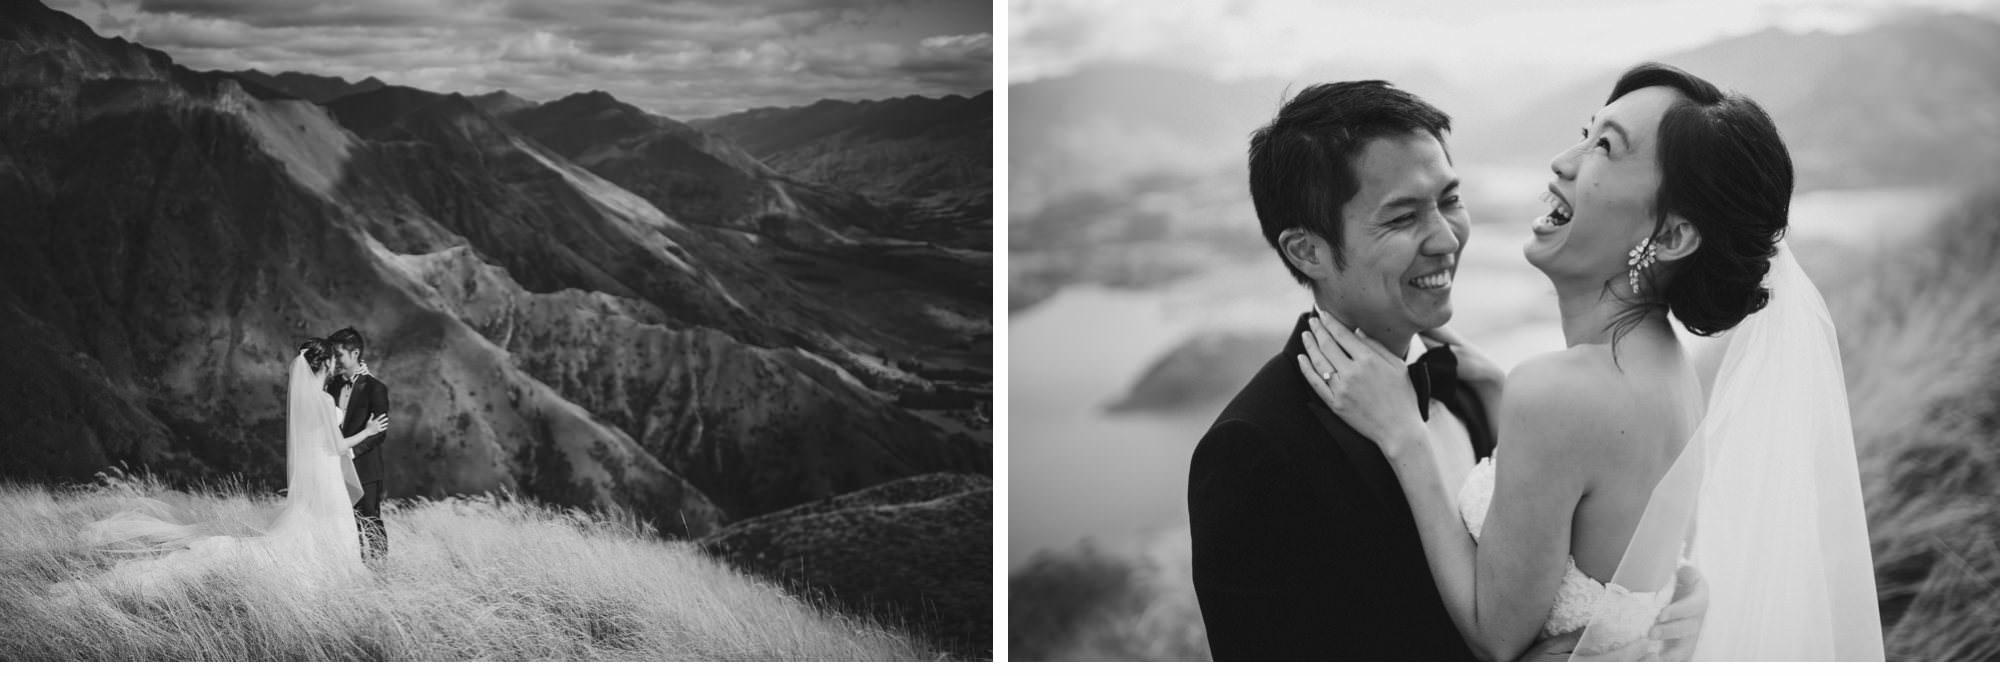 Isobel Glacier Pre Wedding Photography-011.jpg